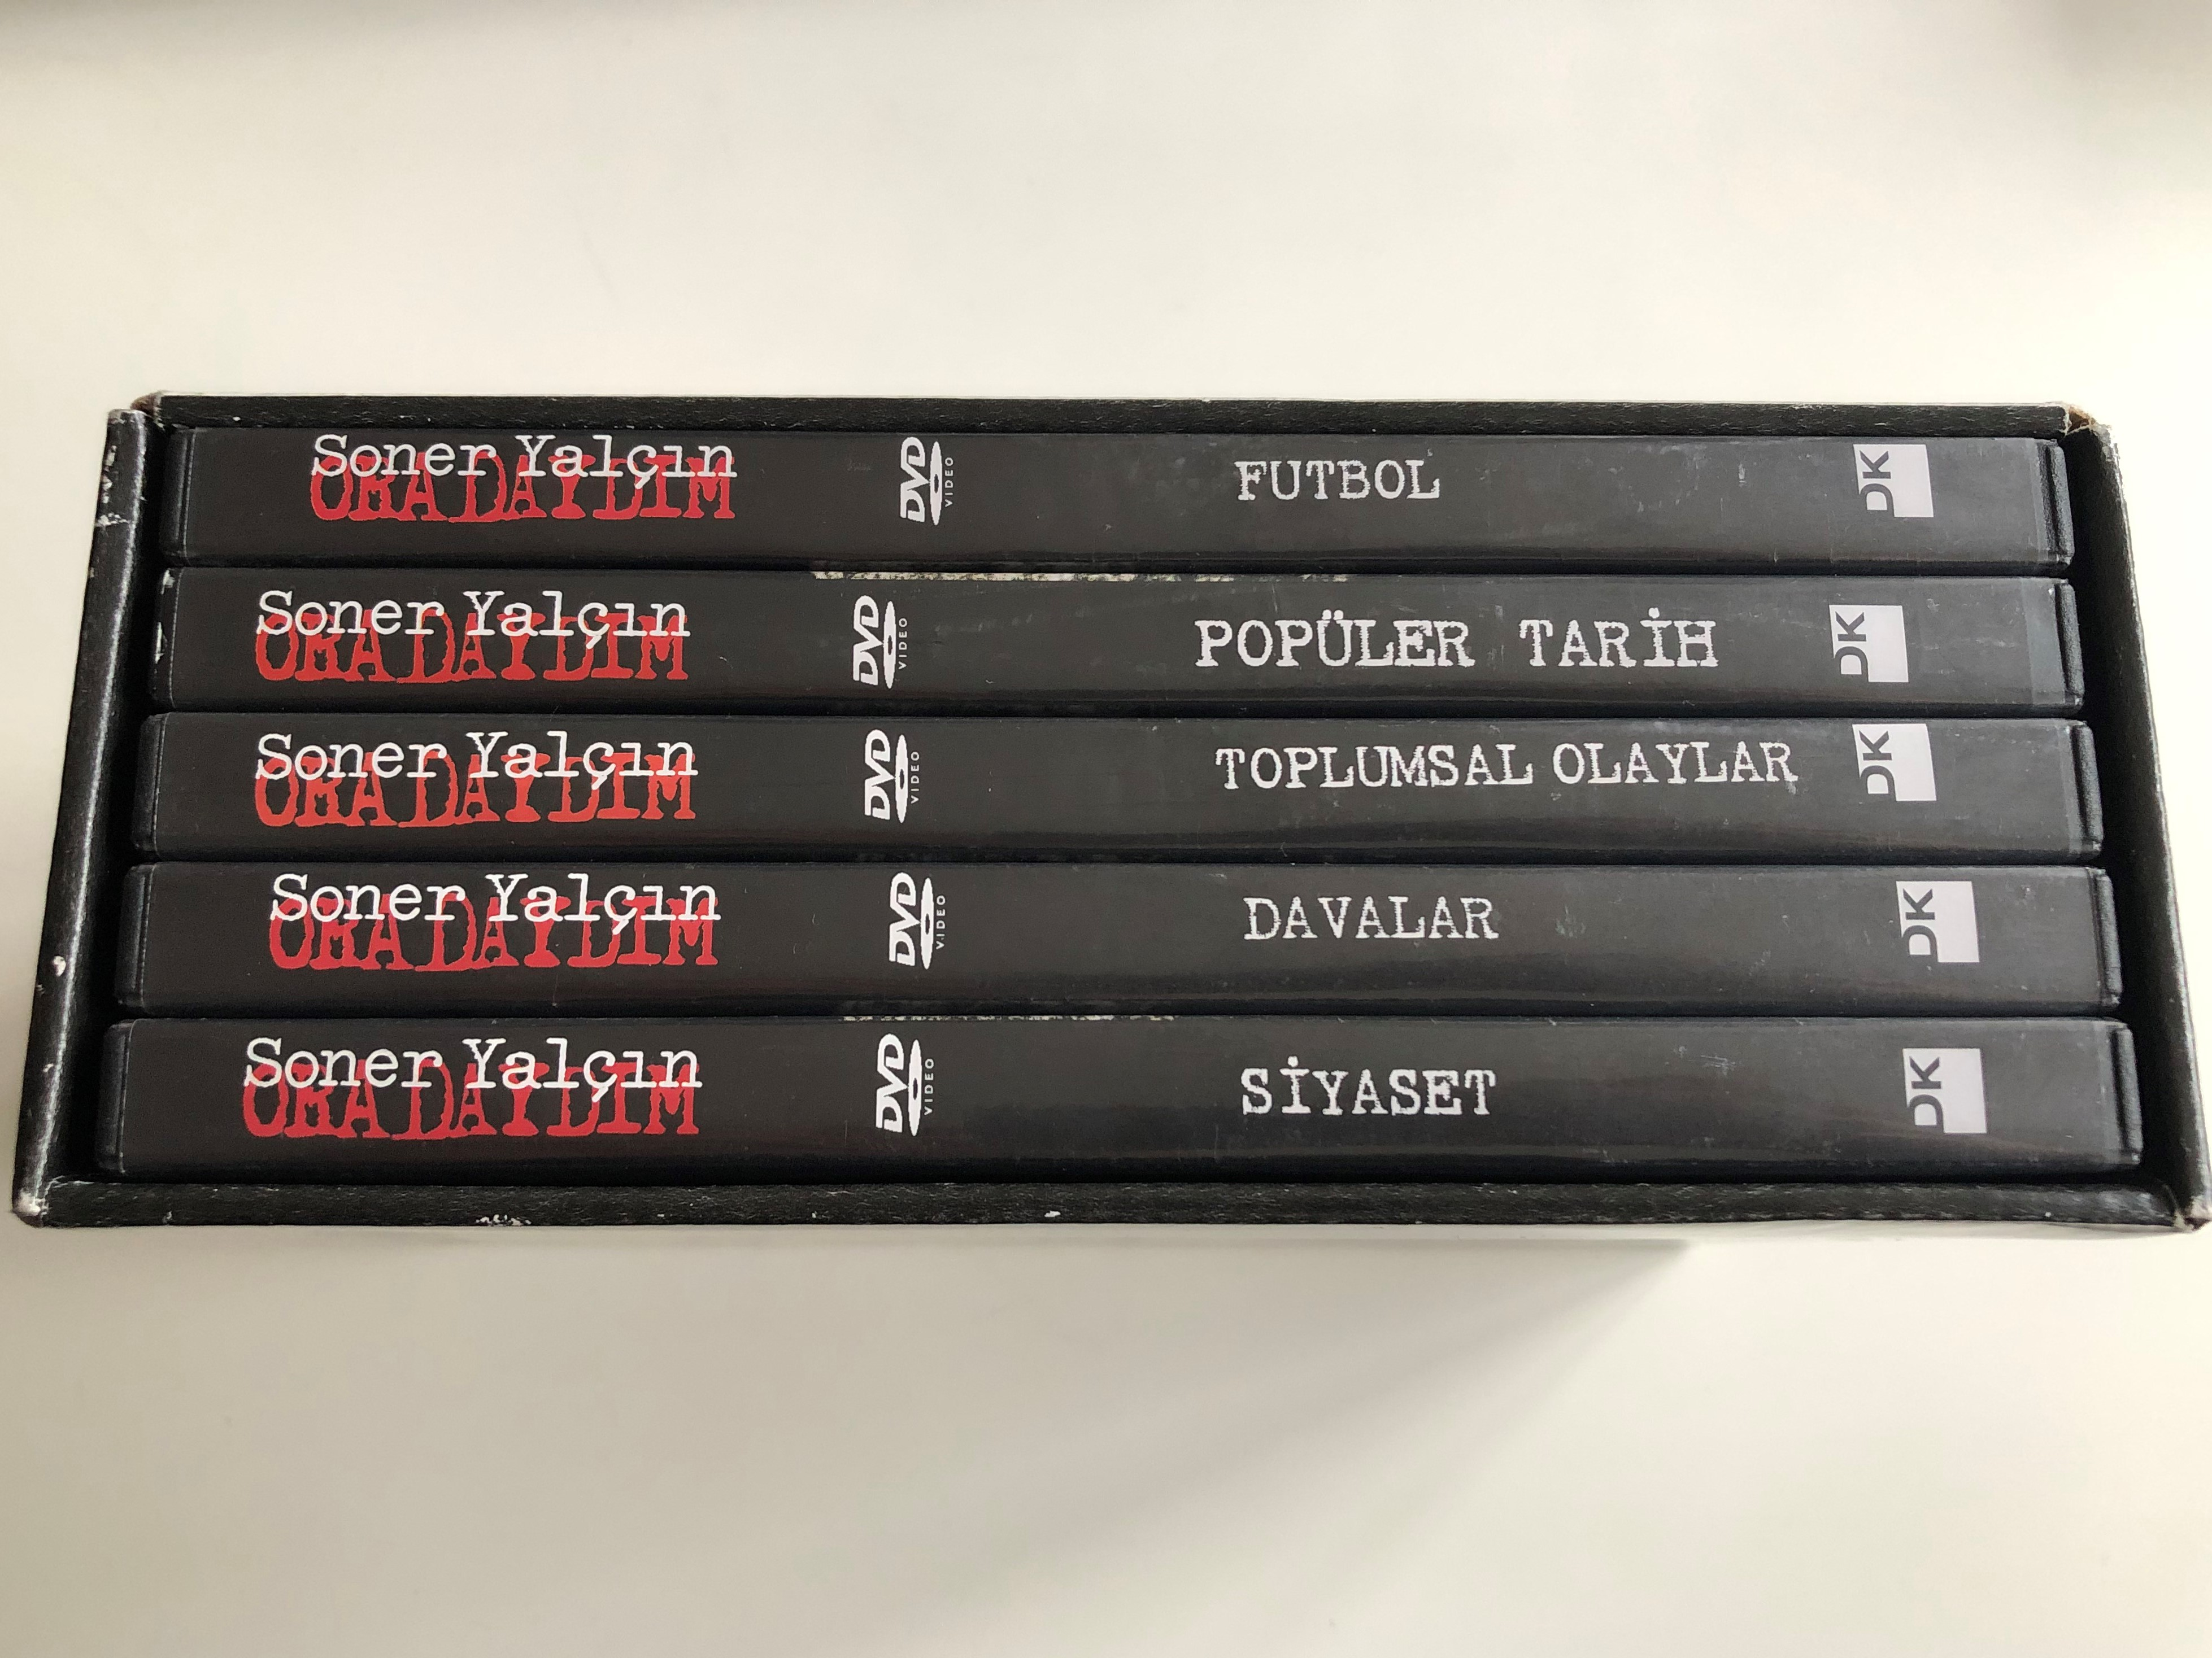 soner-yalcin-oradaydim-dvd-set-2007-5-discs-20-hours-of-content-35-episodes-2.jpg